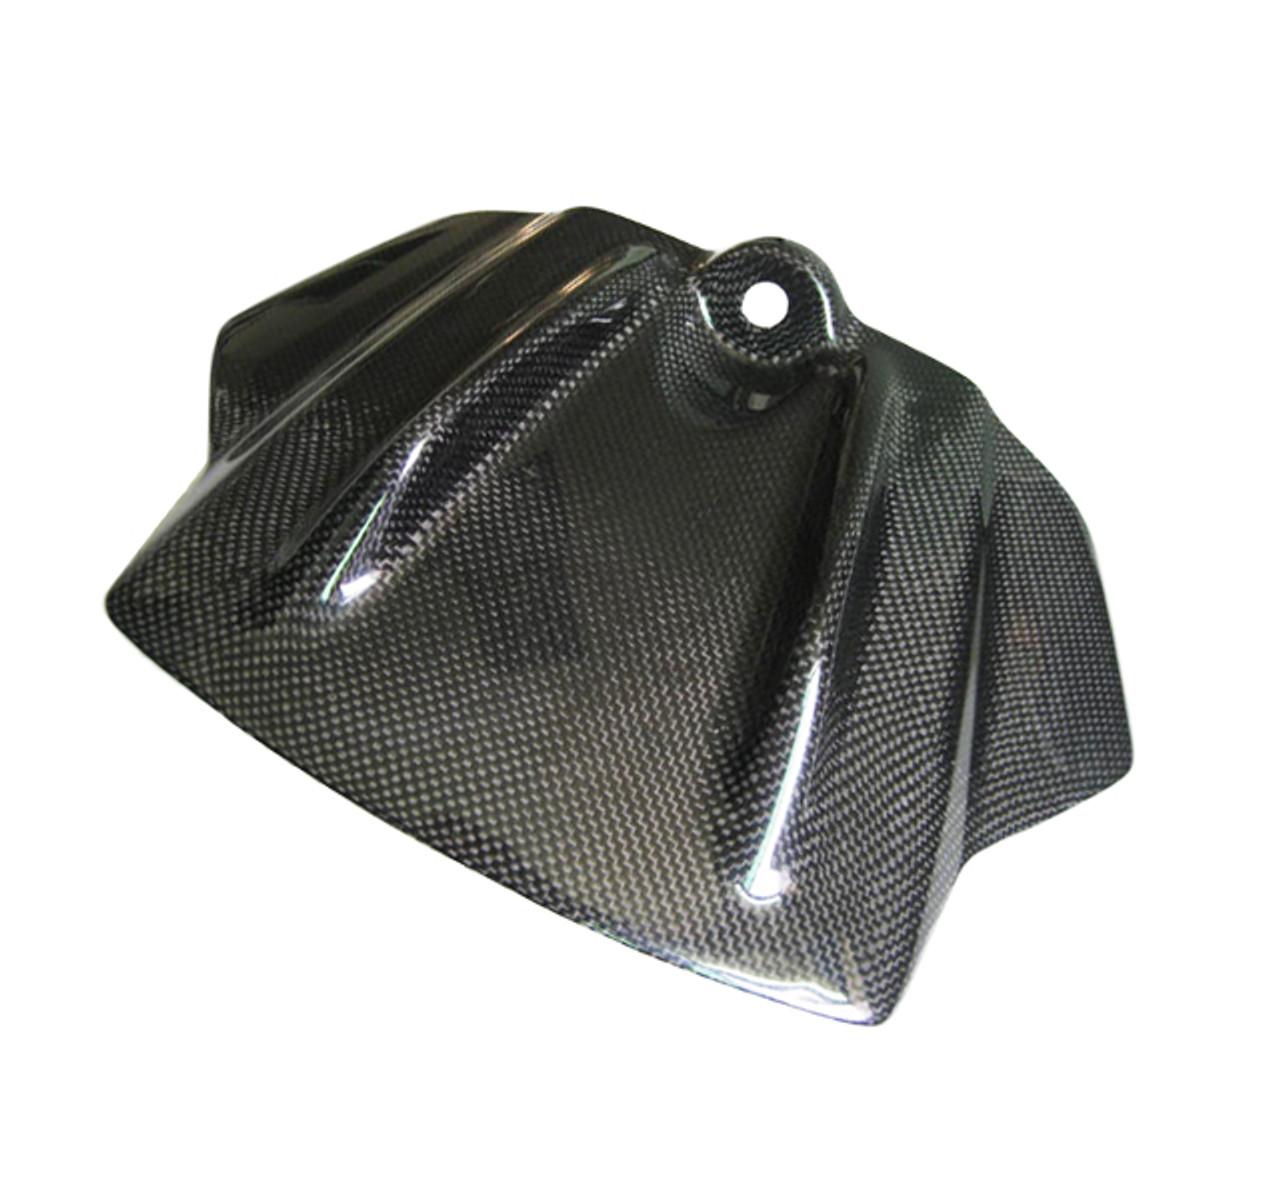 Glossy Plain Weave Carbon Fiber Tank Front Cover for Aprilia RSV4 09-12, Tuono V4 11-13